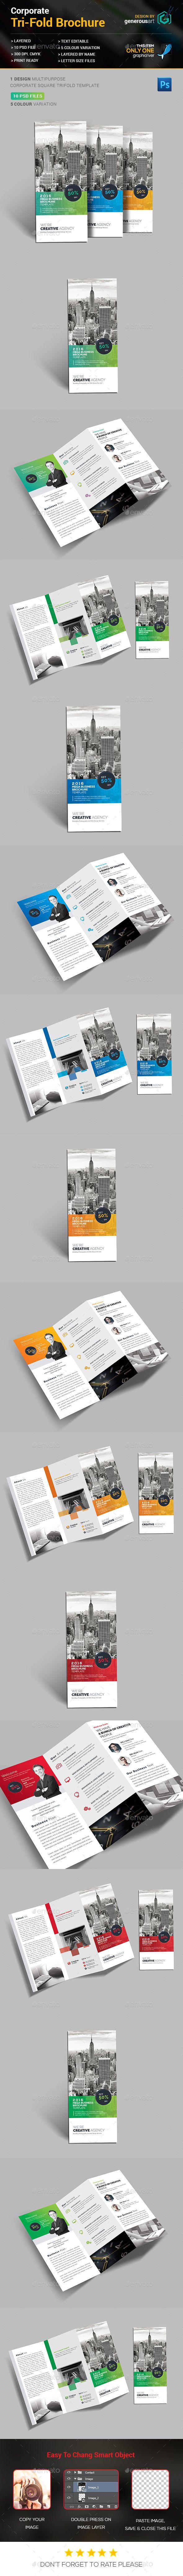 Best Tri Fold Brochure Template Ideas On Pinterest Tri Fold - Tri brochure template